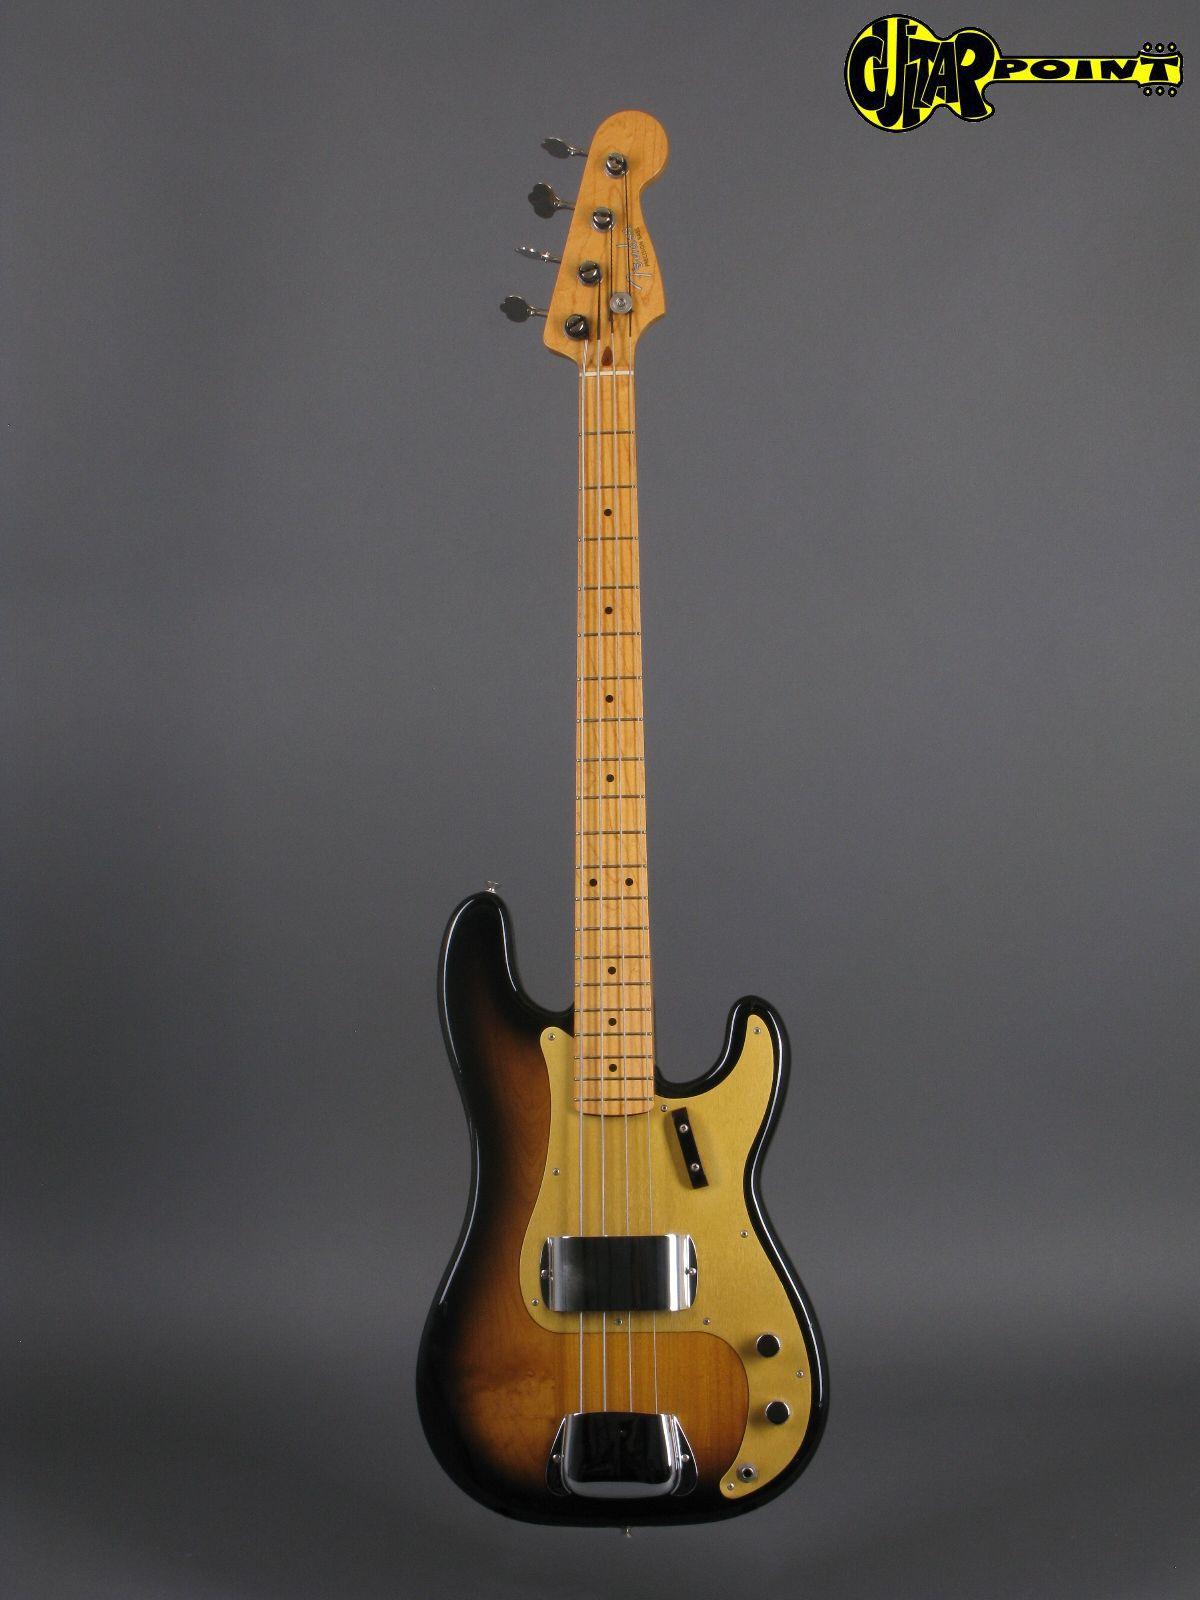 fender 1957 precision fullerton reissue 1982 2 tone sunburst bass for sale guitarpoint. Black Bedroom Furniture Sets. Home Design Ideas